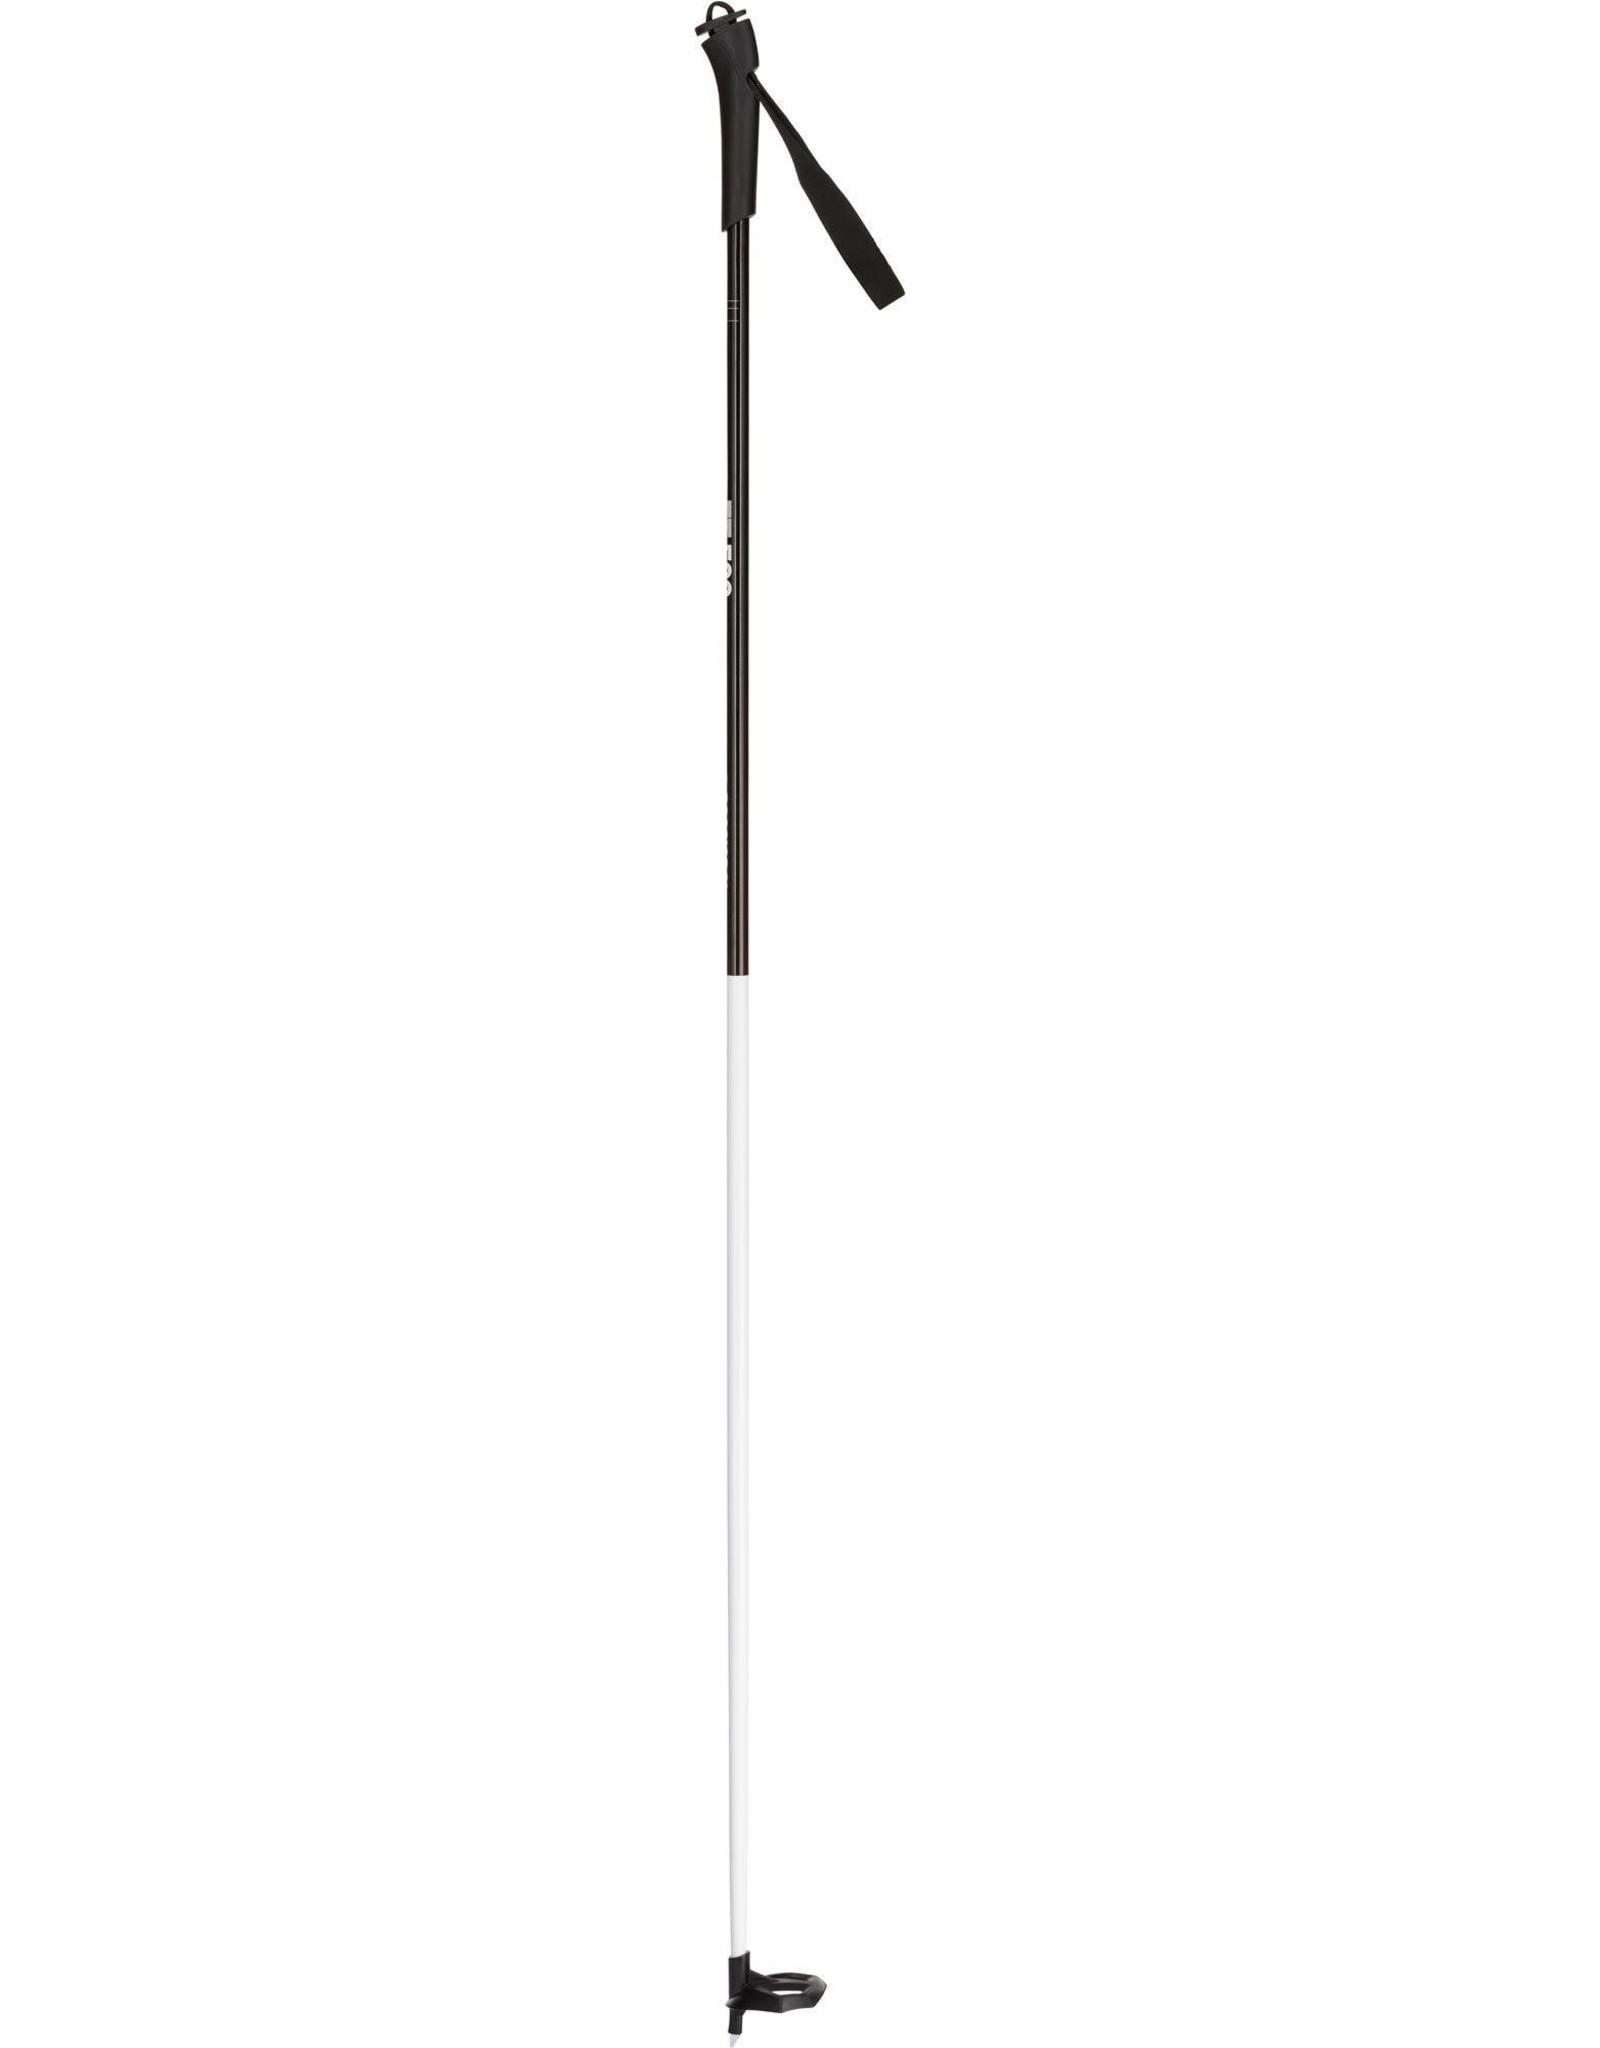 ROSSIGNOL ROSSIGNOL BATON SKI DE FOND FT-500 SR 19